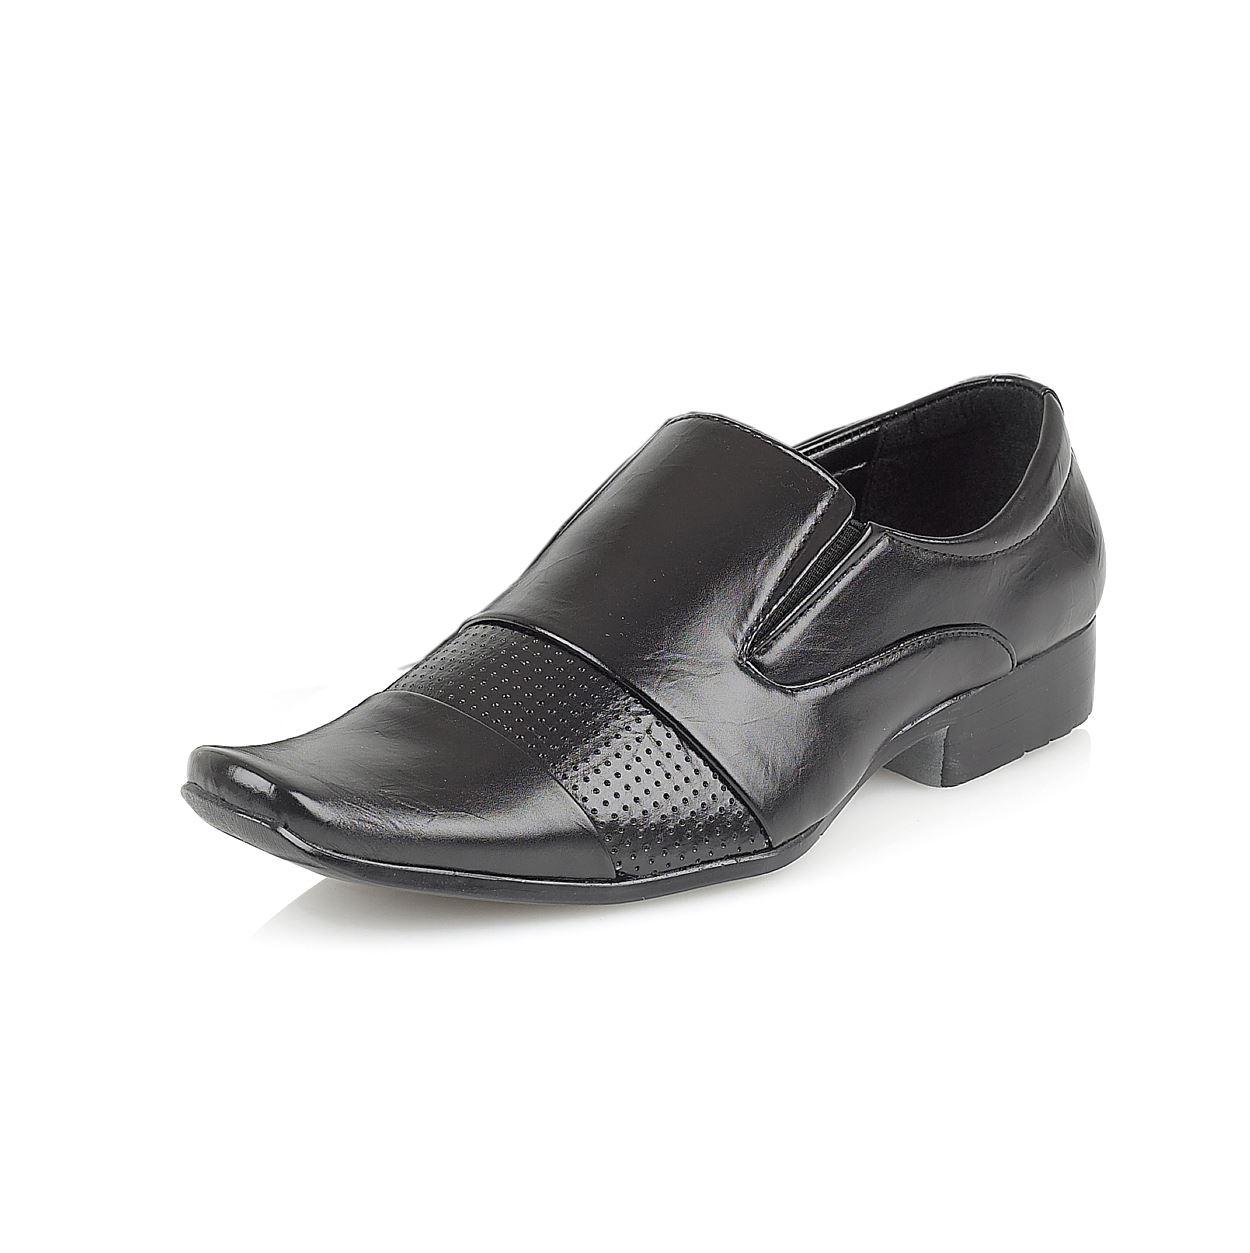 Casual Wedding Shoes 027 - Casual Wedding Shoes